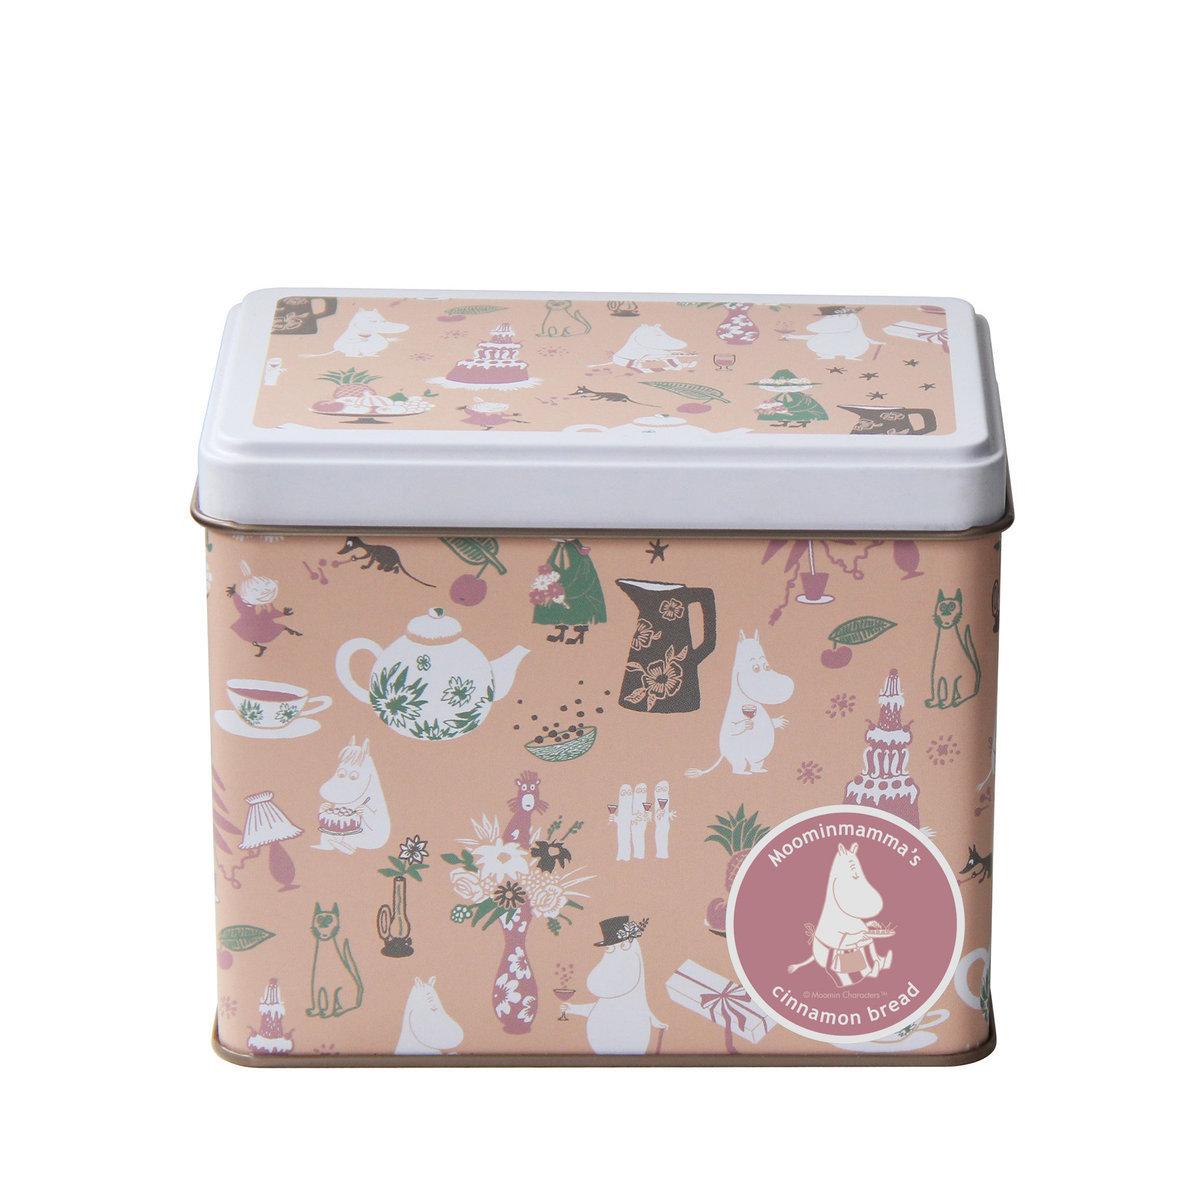 Hokka 姆明造型肉桂餅鐵罐禮盒130g